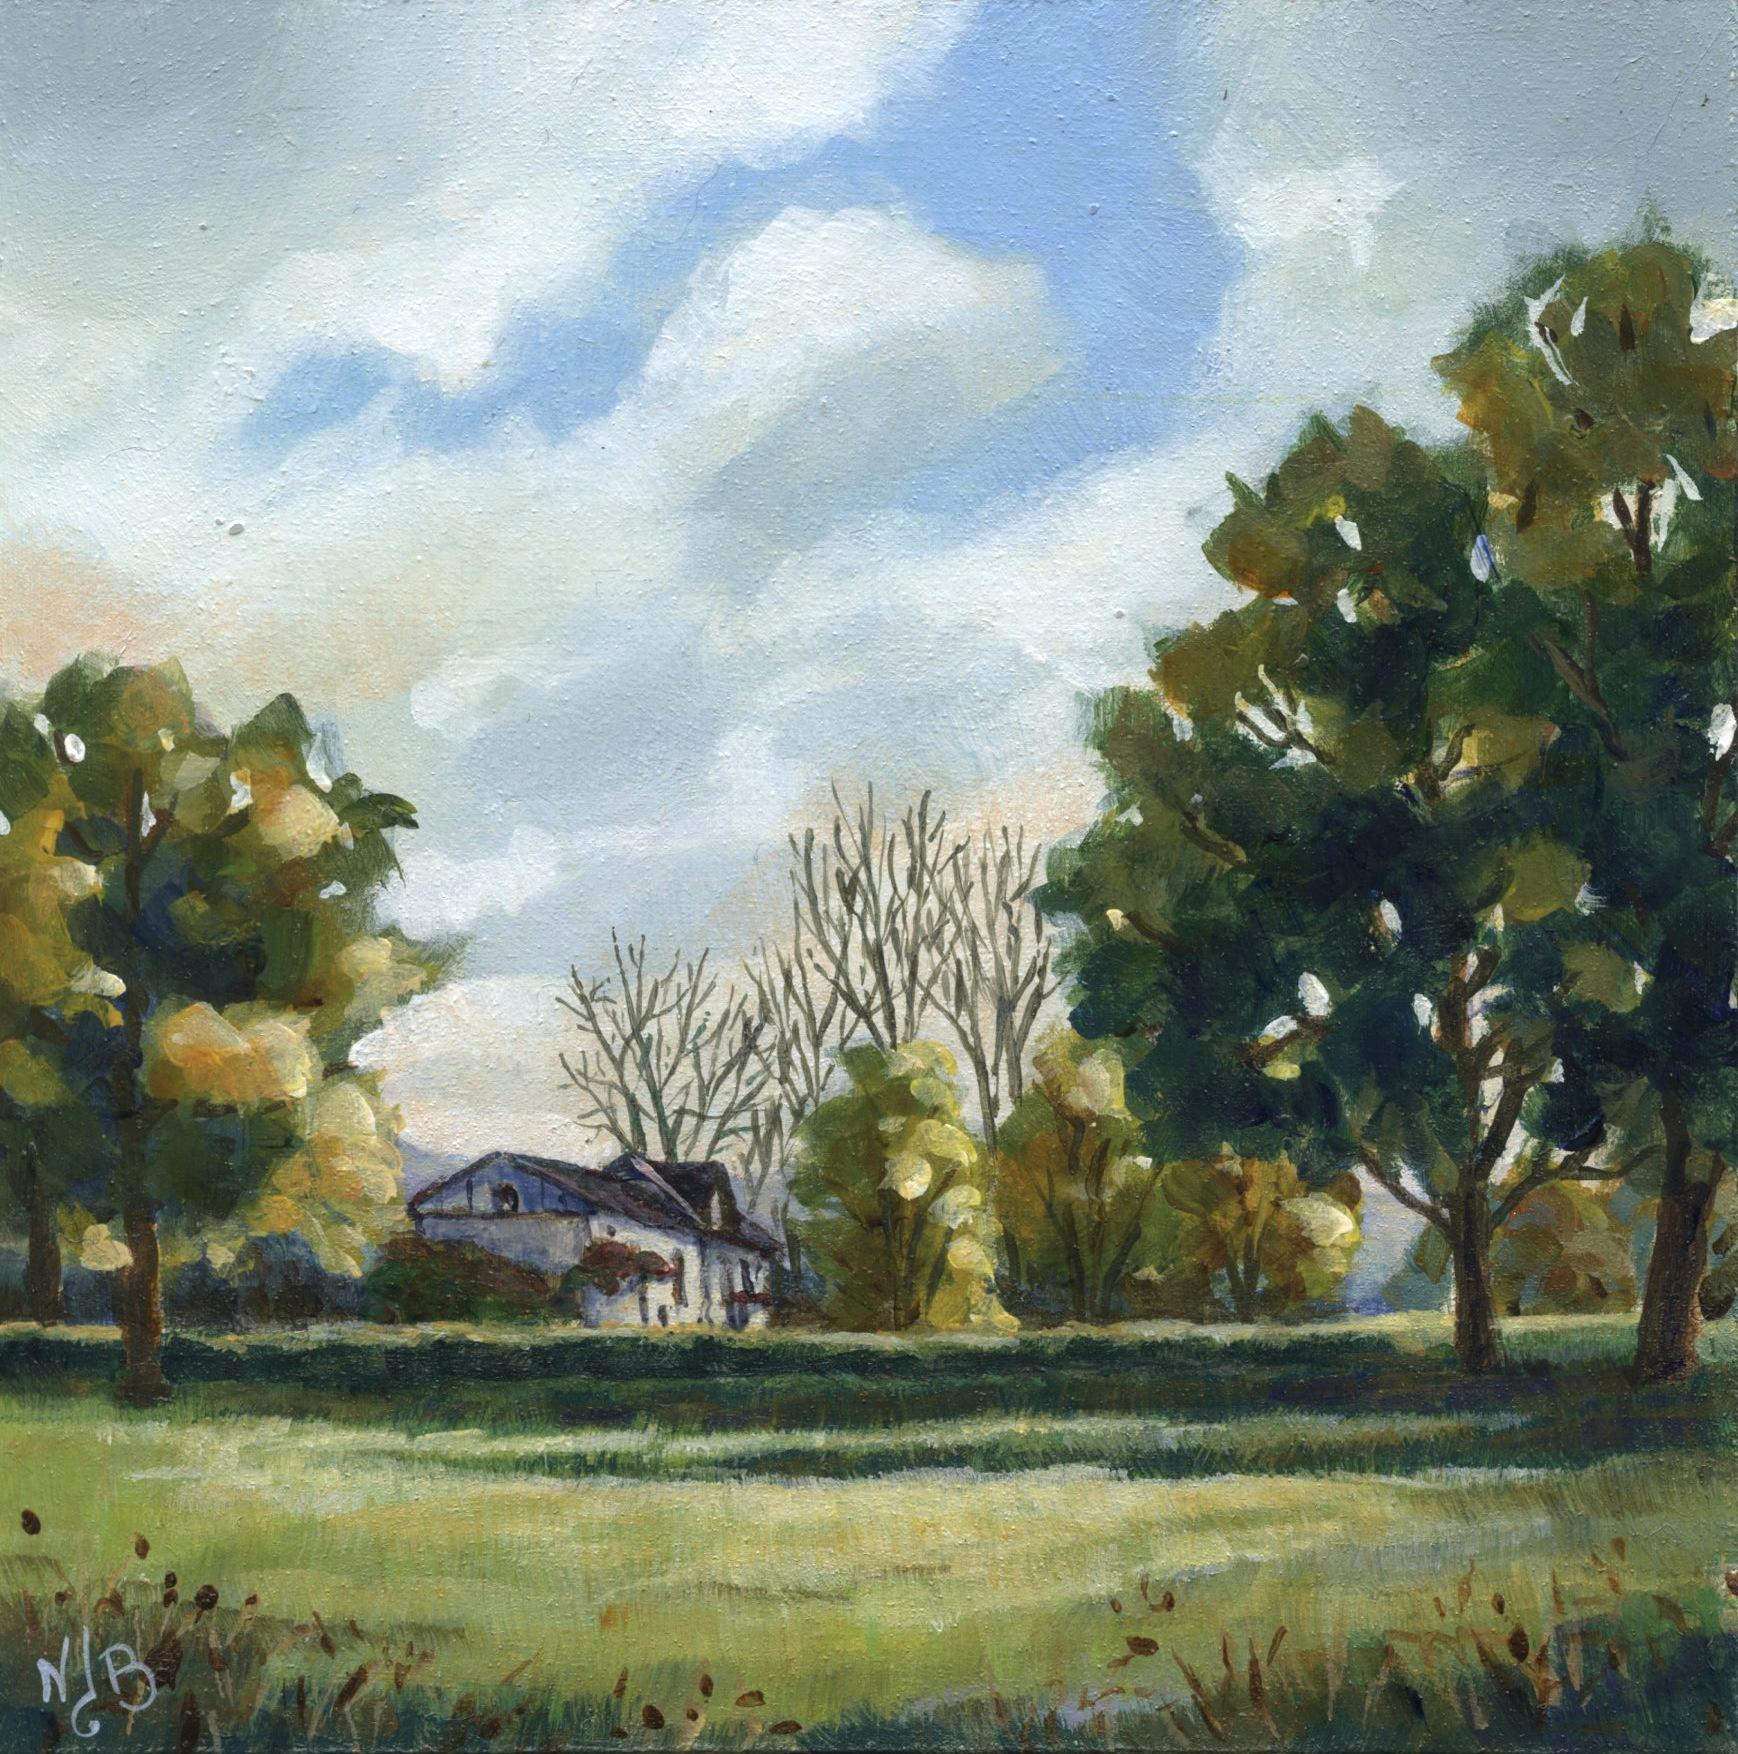 Oil painting, landscape painting